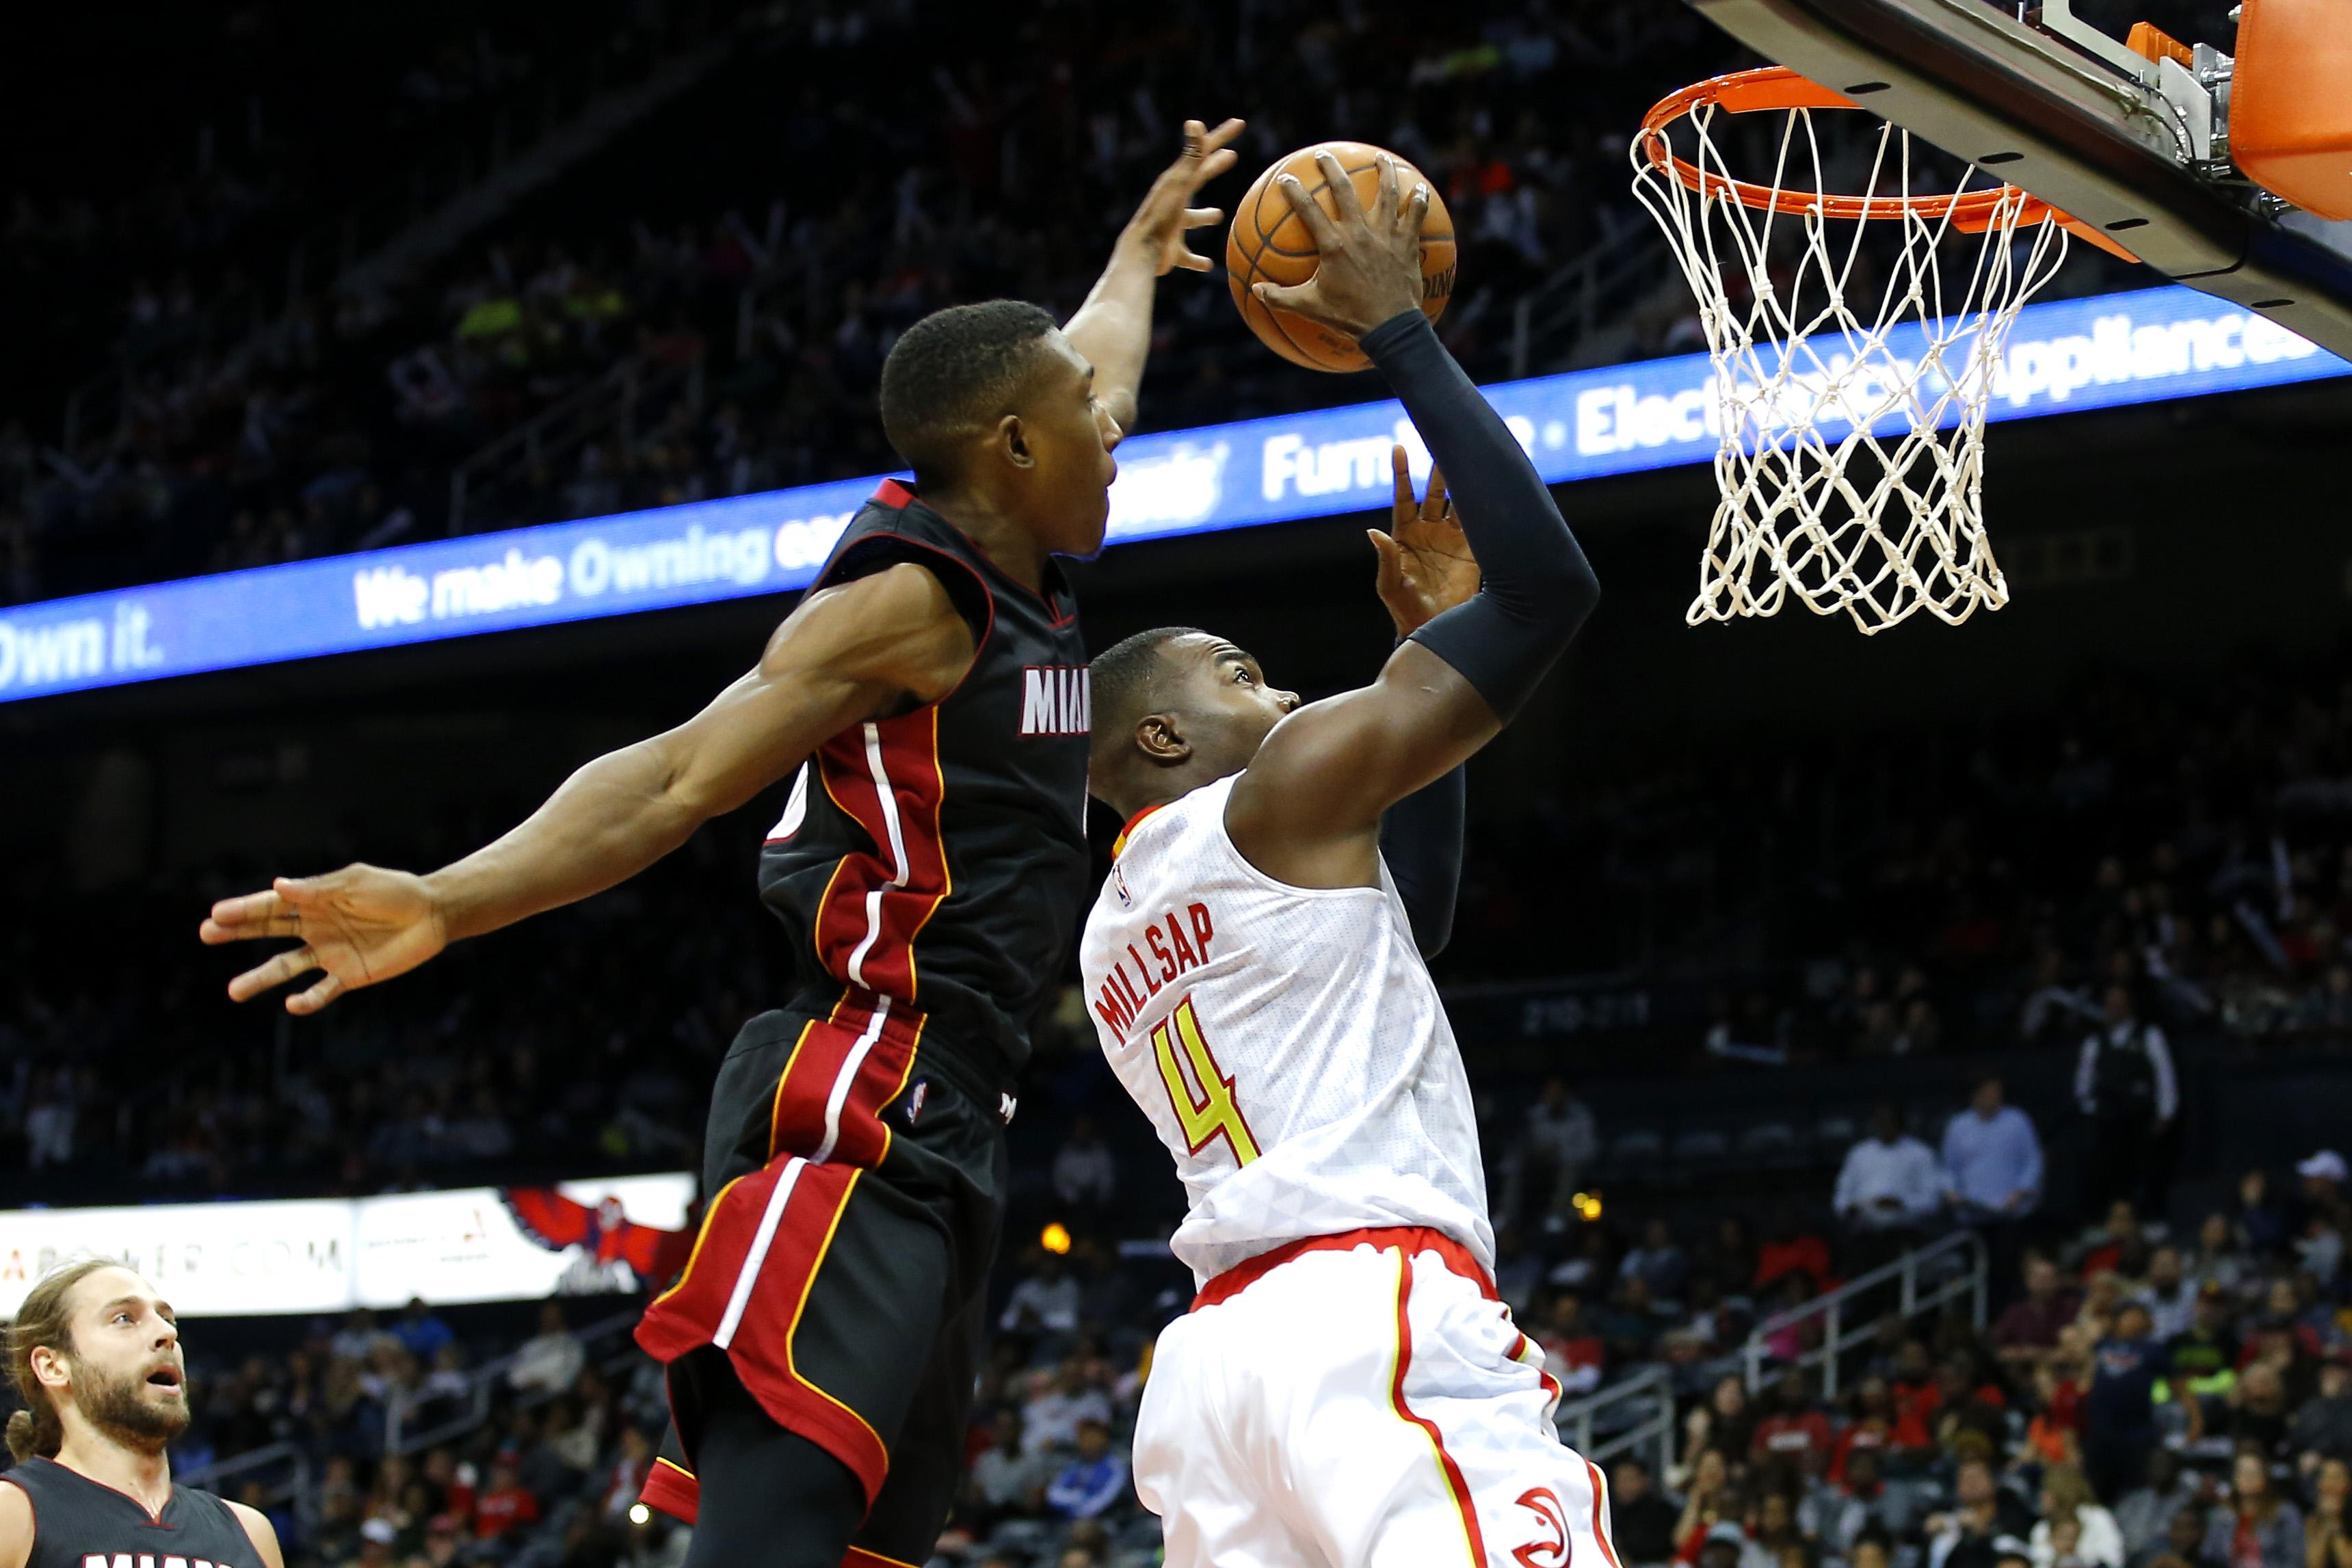 Miami Heat guard Josh Richardson (0) is called for a foul against Atlanta Hawks forward Paul Millsap (4) in the first half of a preseason NBA basketball game, Sunday, Oct. 18, 2015, in Atlanta. (AP Photo/Todd Kirkland)